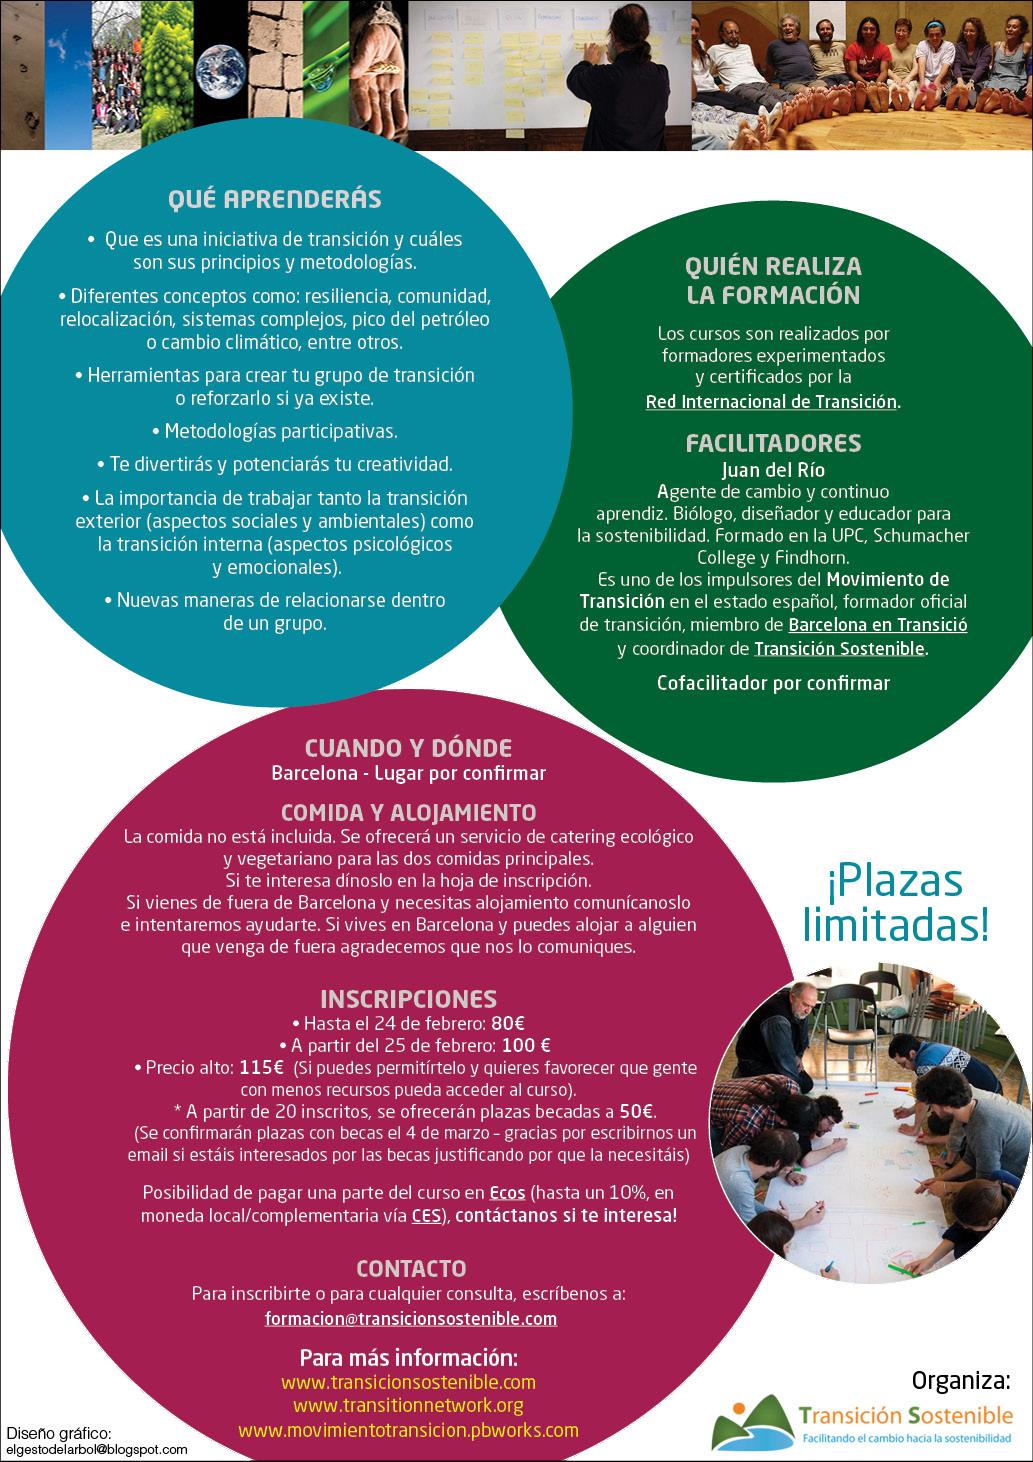 Curso oficial de Transición marzo 2013 Barcelona 2 - Transición Sostenible